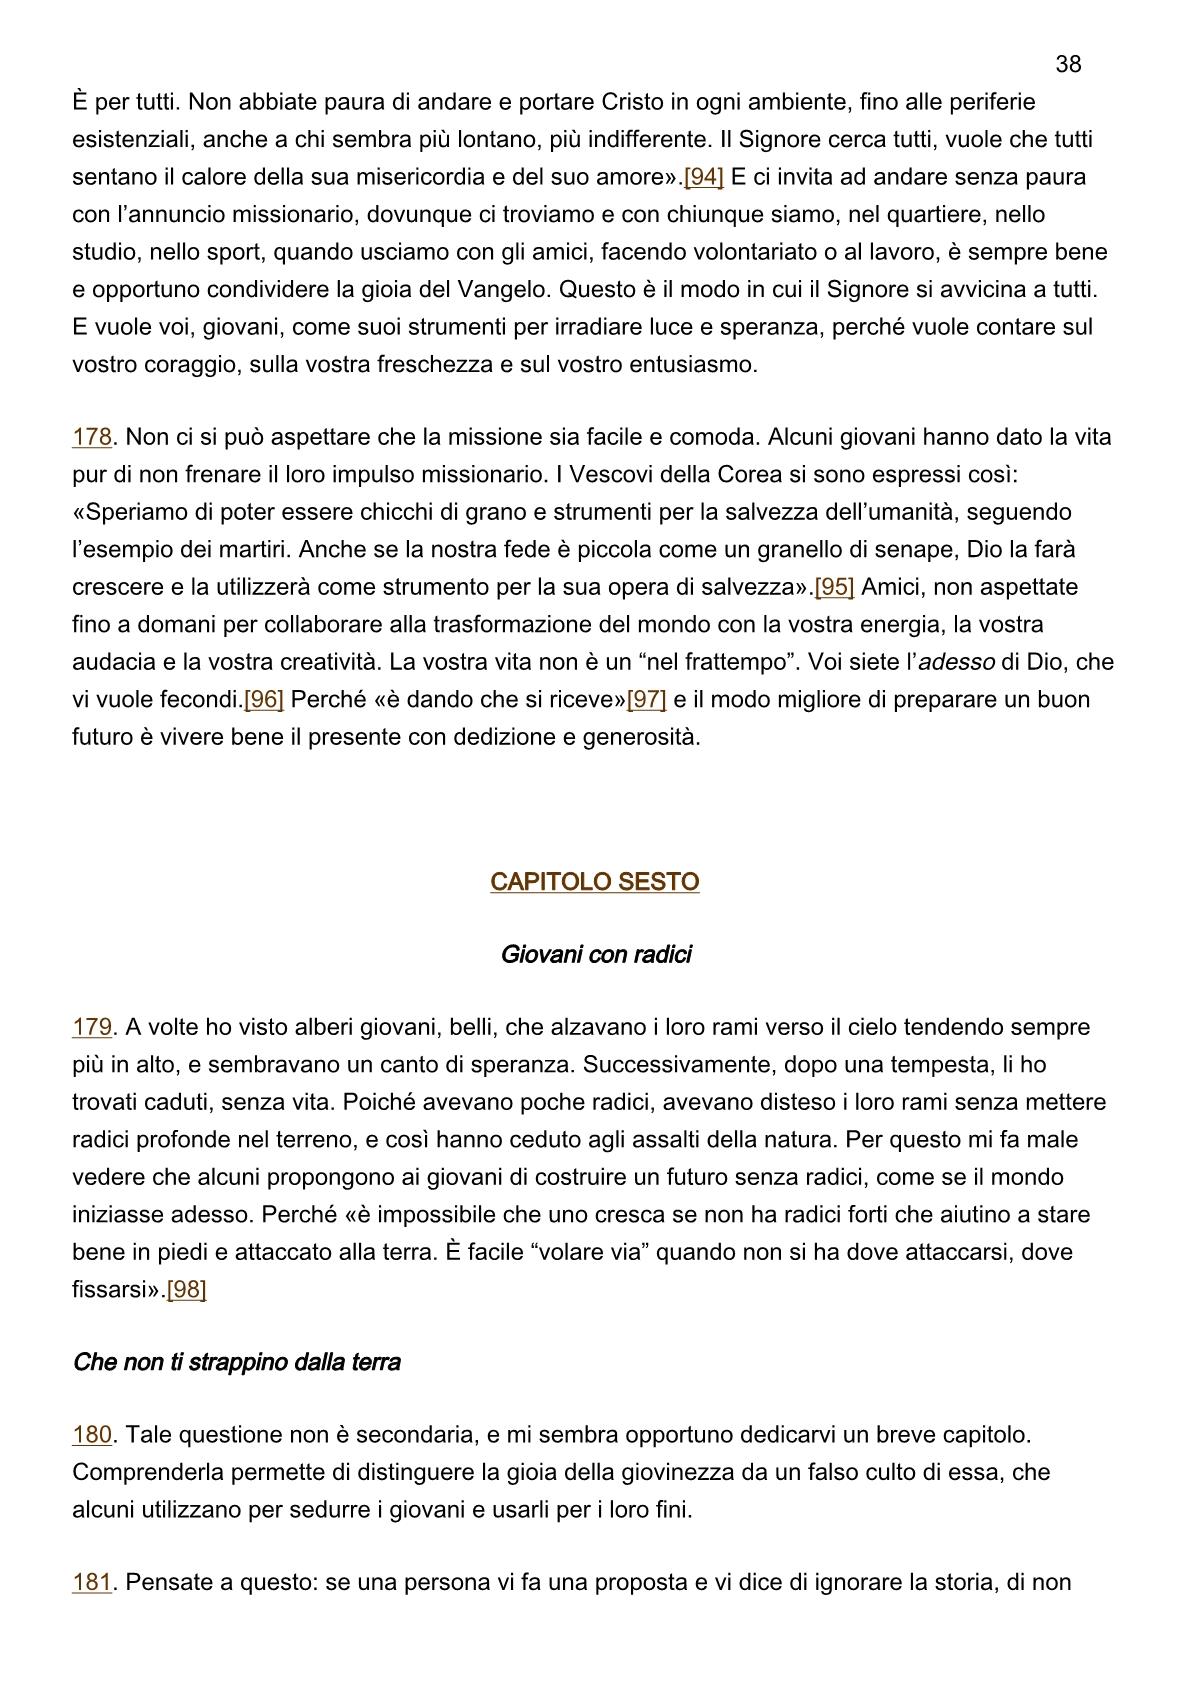 papa-francesco_esortazione-ap_20190325_christus-vivit38